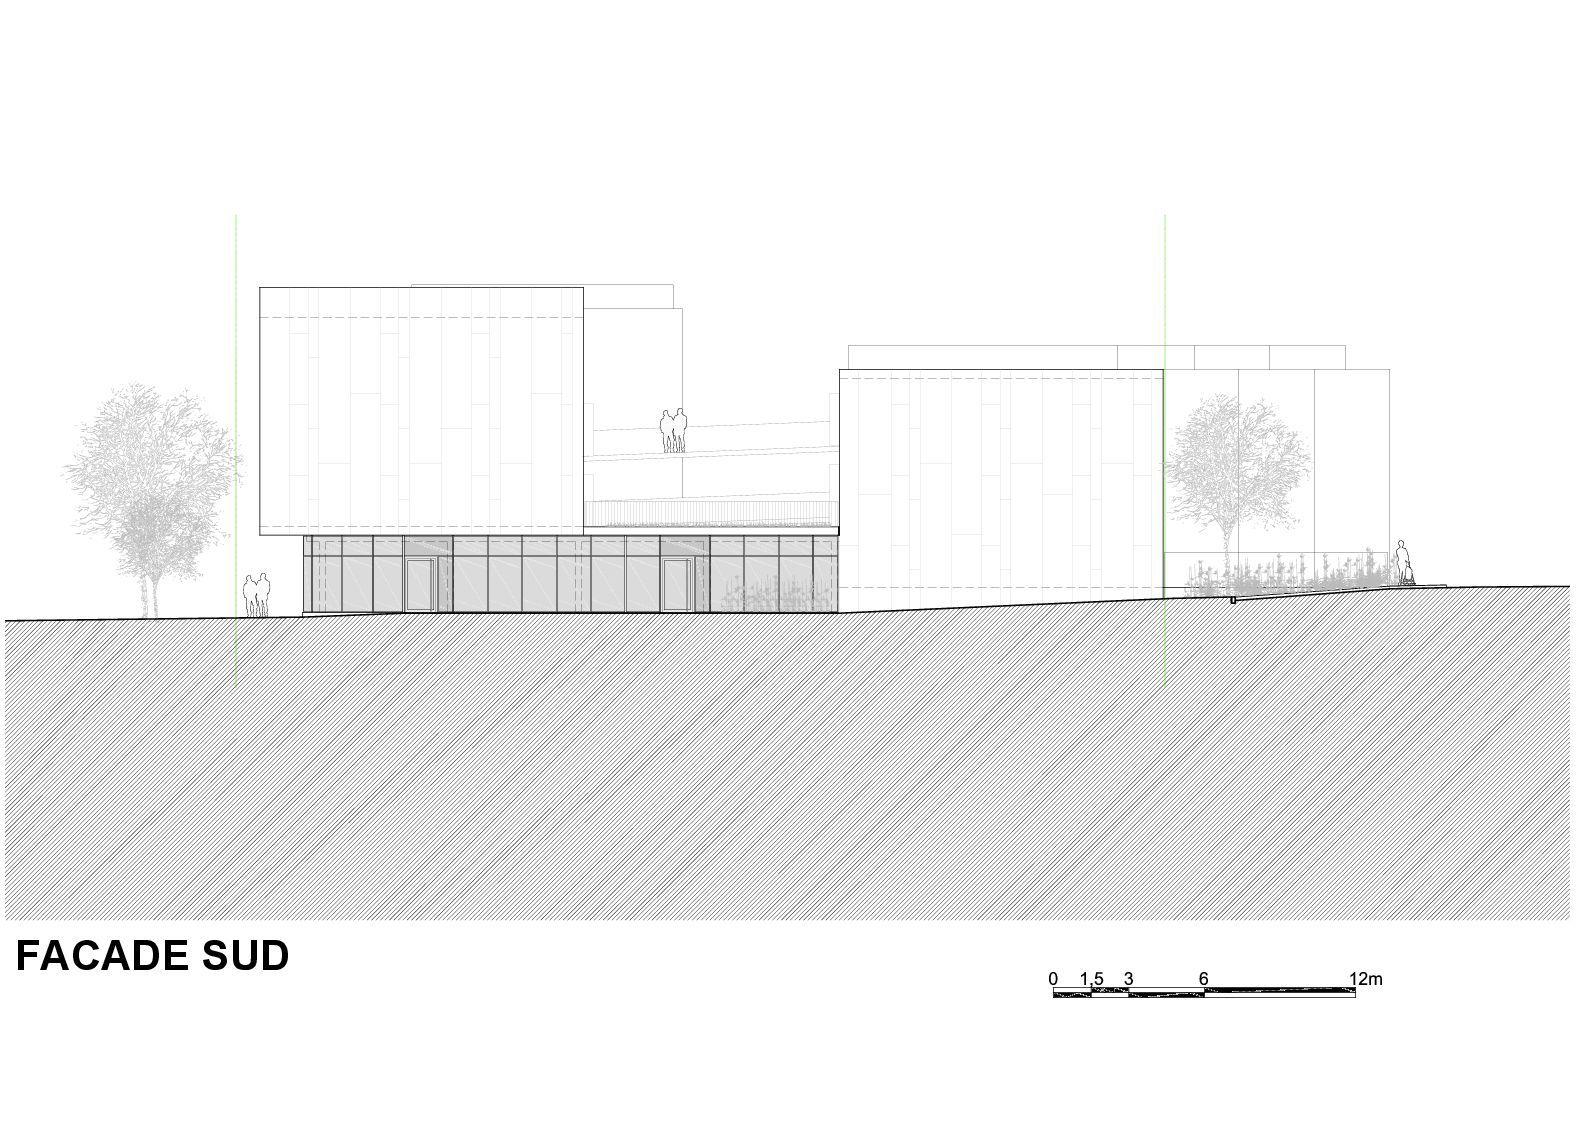 galeria de habita o social lojas em mouans sartoux comte et vollenweider architectes 42. Black Bedroom Furniture Sets. Home Design Ideas